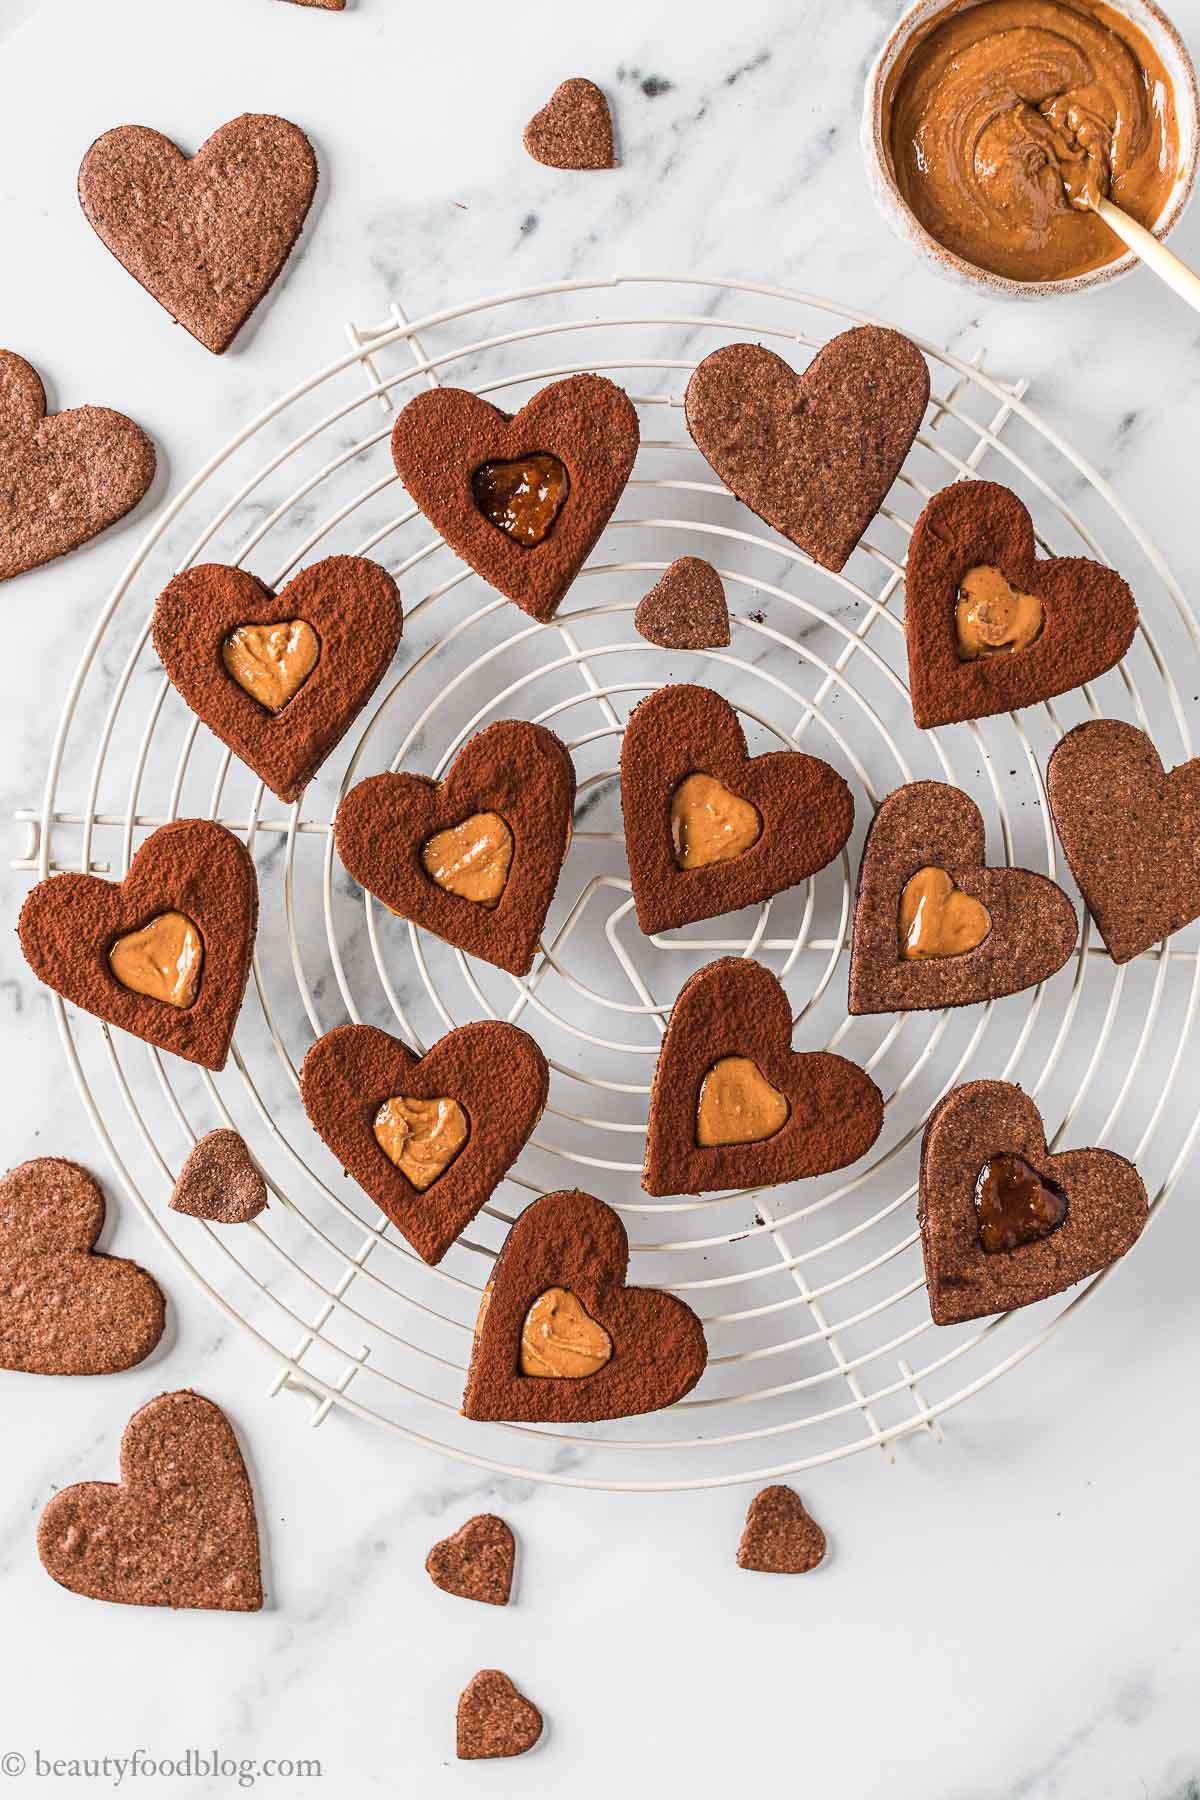 Ricetta Frollini vegani senza glutine al cacao biscotti gluten-free vegan chocolate almond Linzer cookies recipe